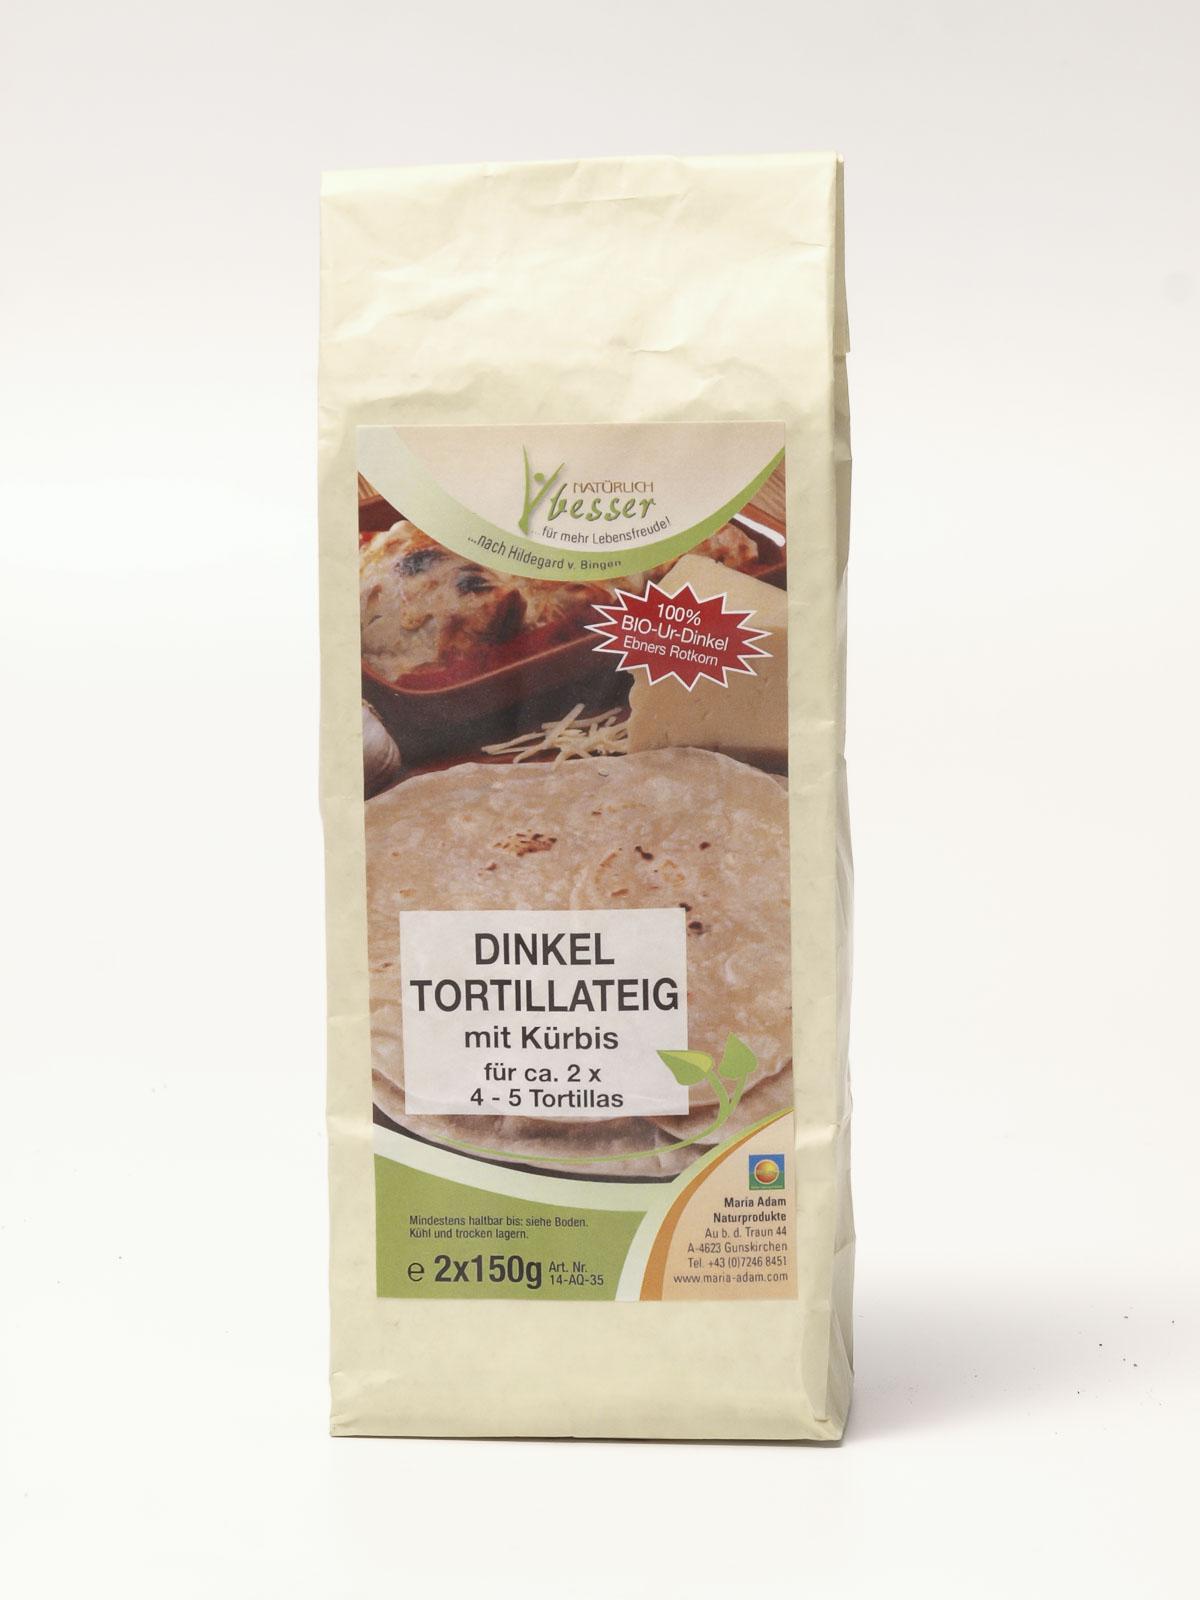 Dinkel Tortillateig